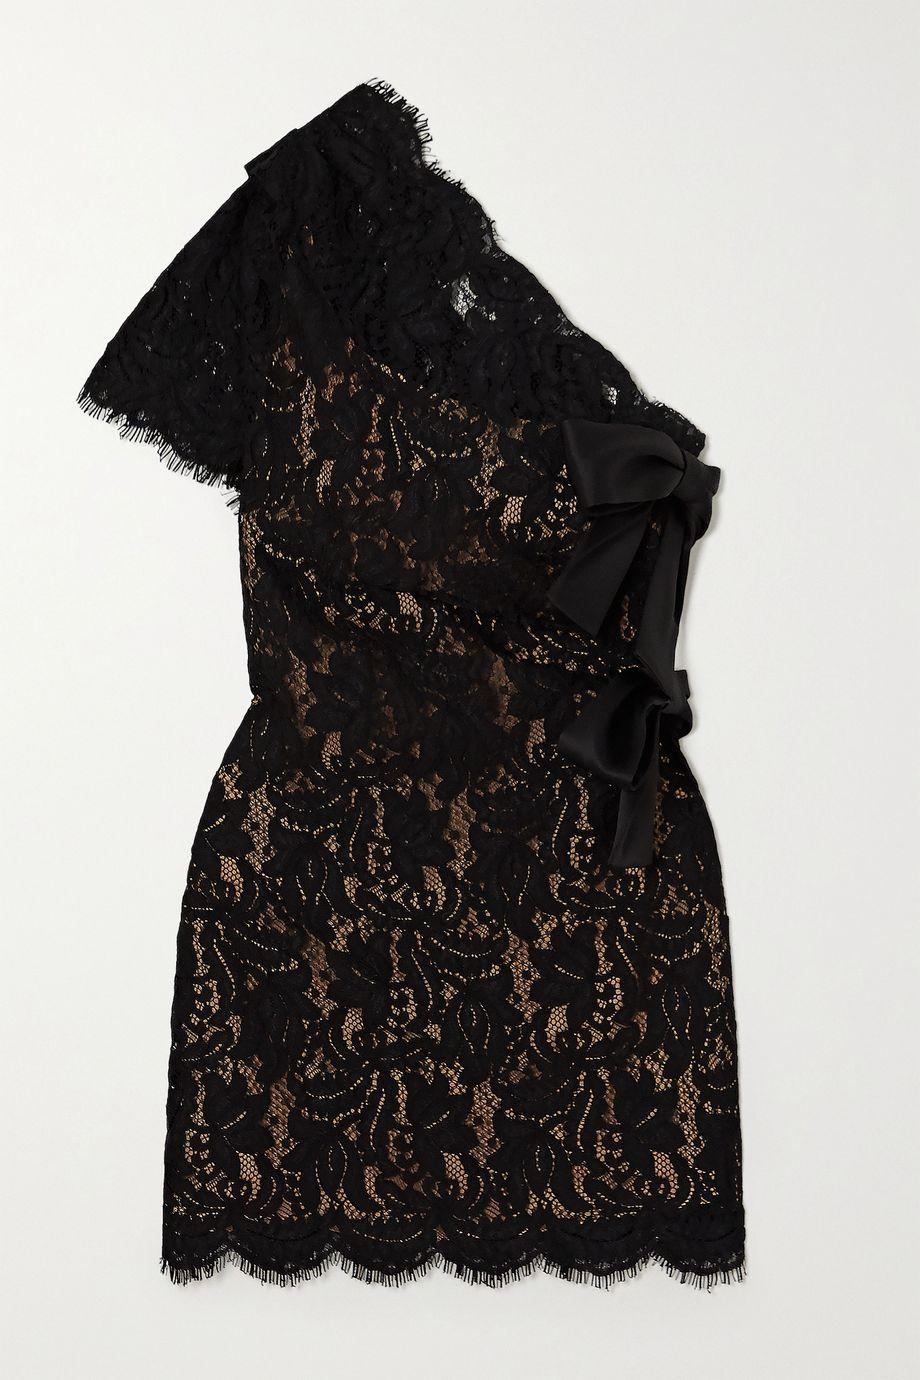 SAINT LAURENT One-sleeve bow-embellished lace mini dress